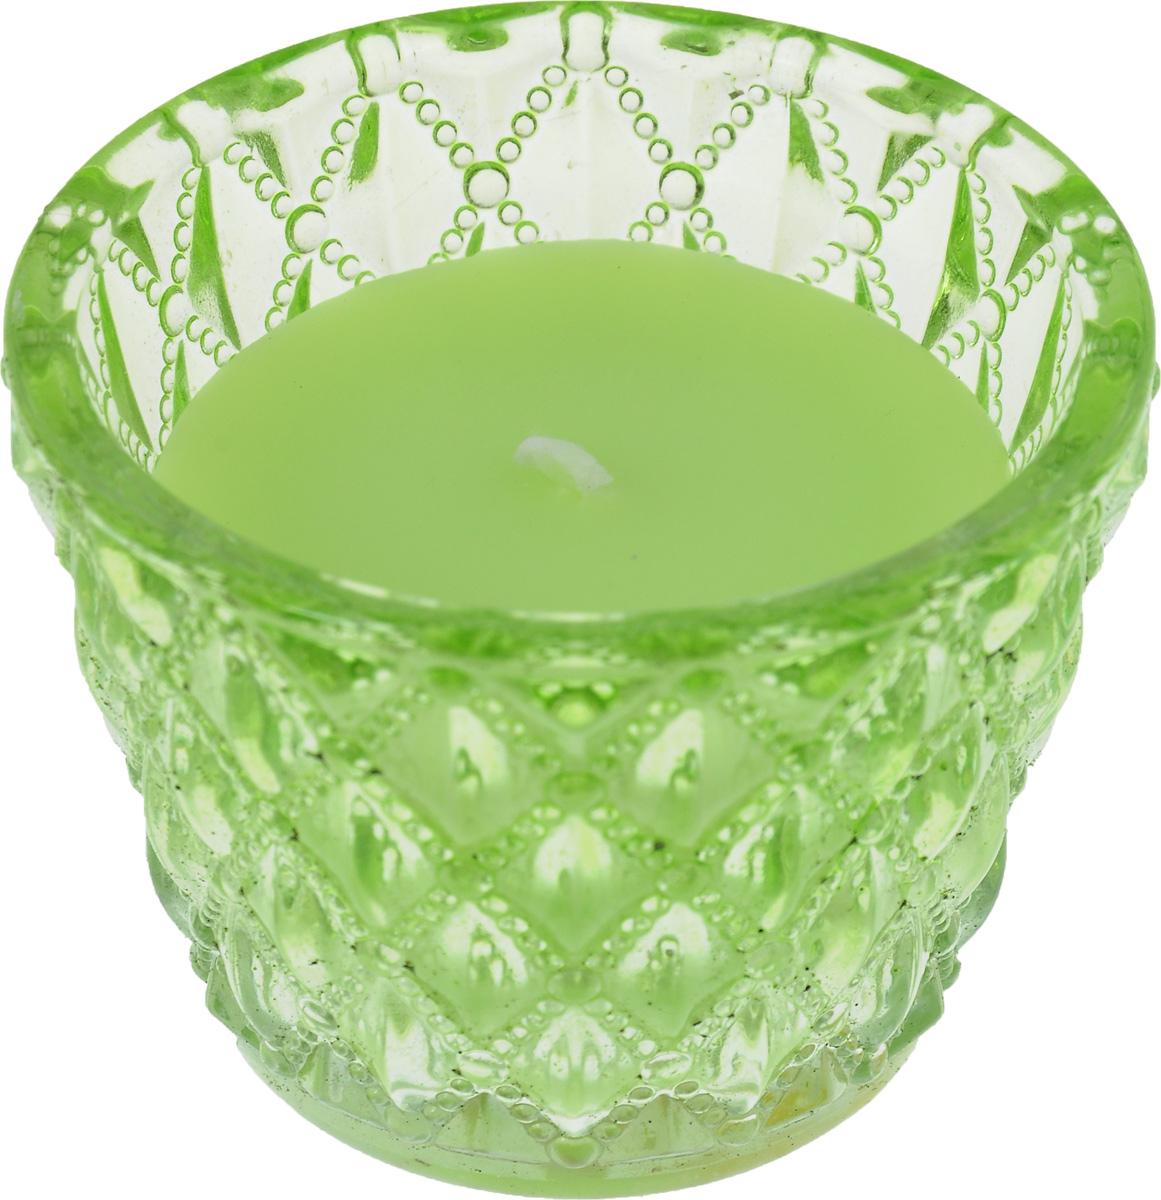 Декоративная ароматизированная свеча Magic Home, аромат Зеленый чай, 41225 свеча декоративная феникс презент яблоко ароматизированная в банке 32795